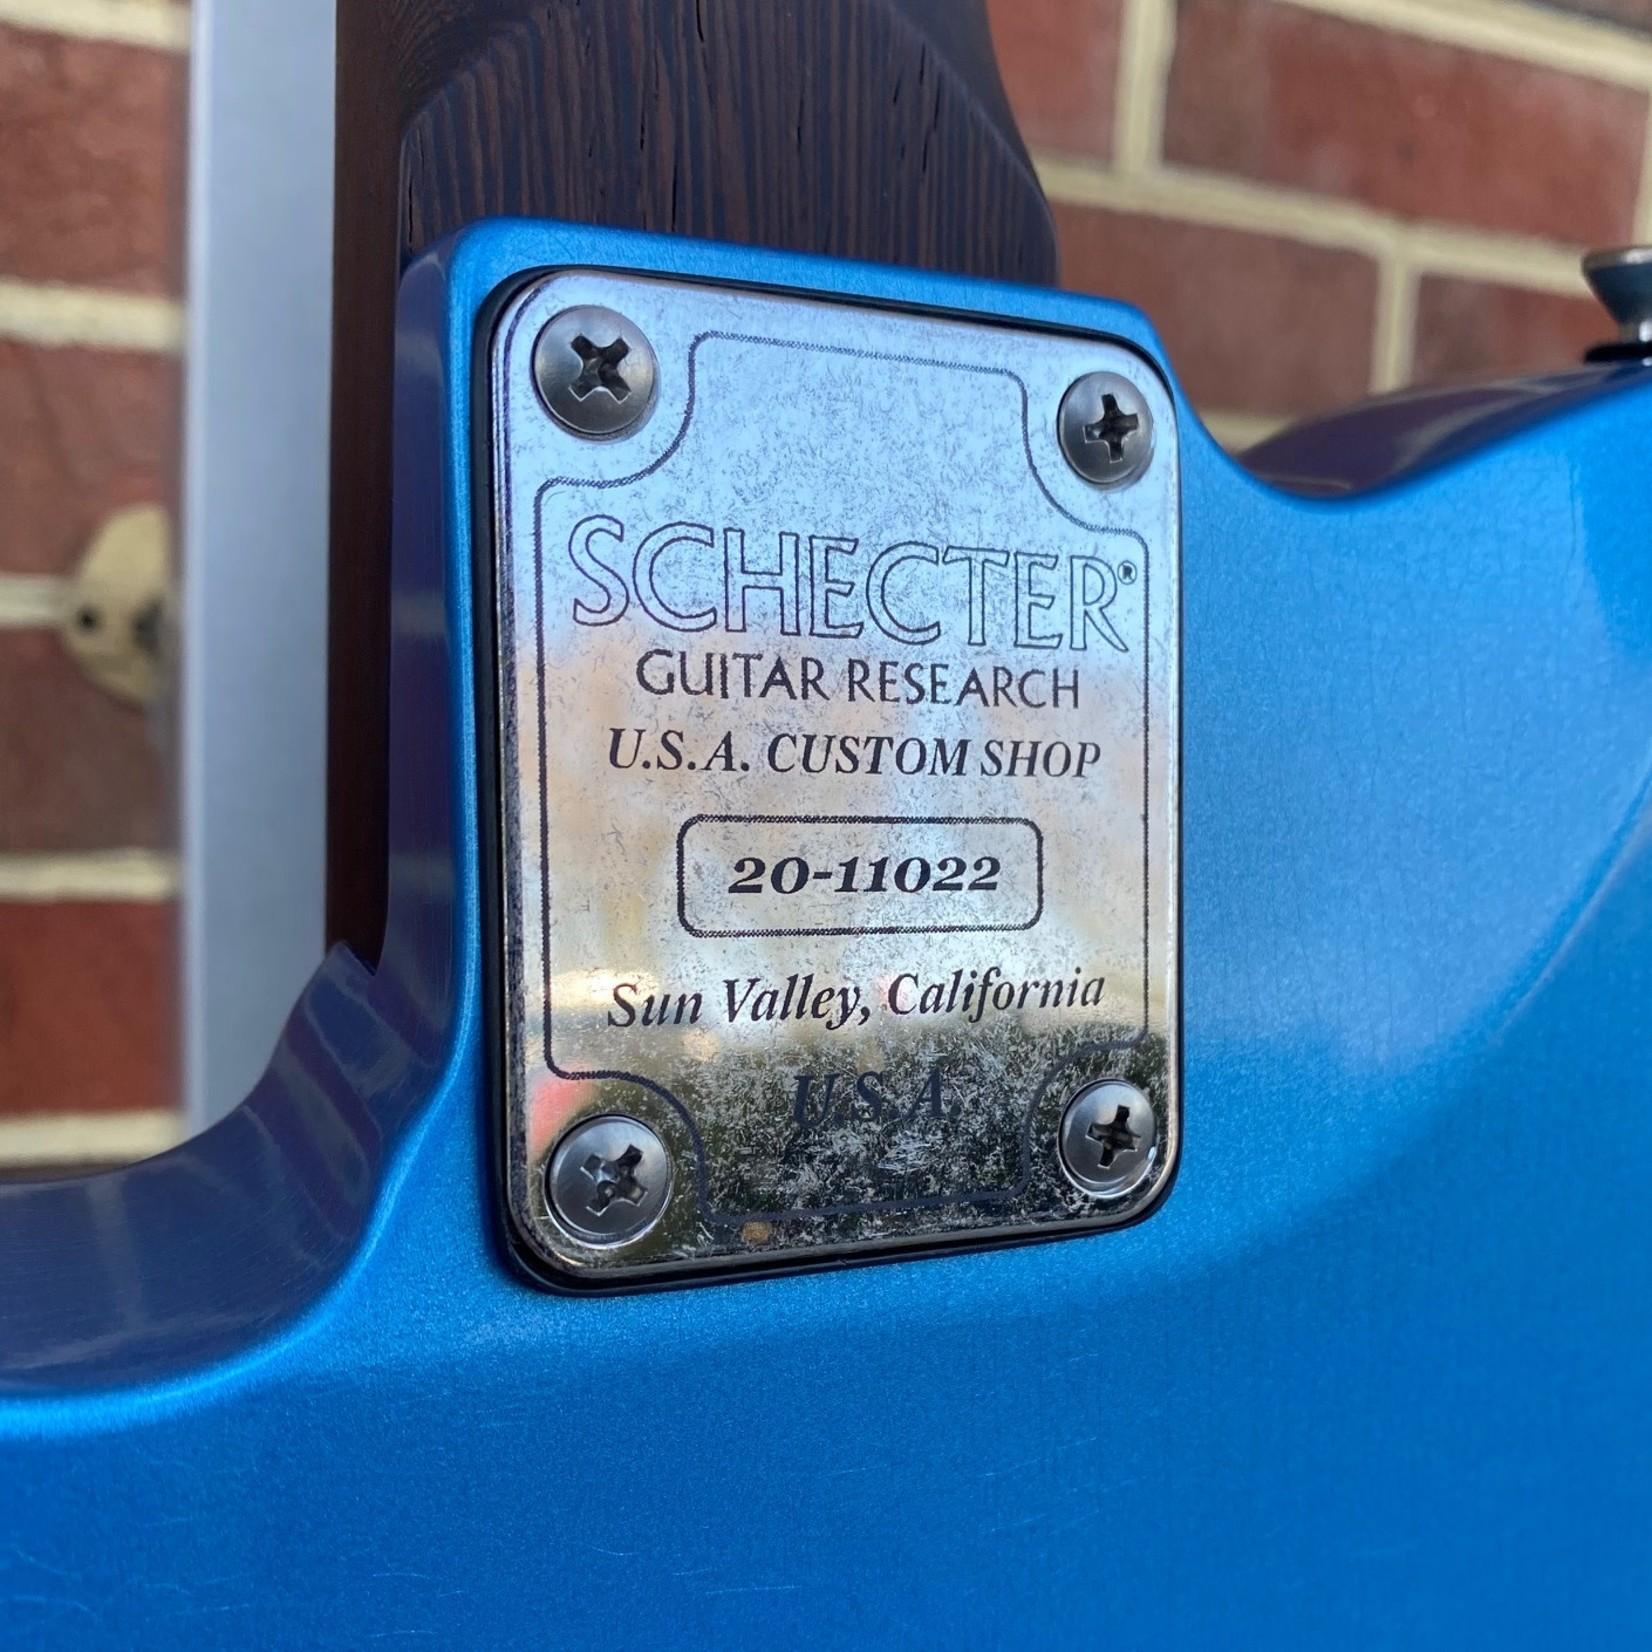 Schecter Guitar Research Schecter USA Custom Shop Nick Johnston PT, Lake Placid Blue Aged Nitro, Wenge Neck, Macassar Ebony, Alder Body, Aged Hardware, Hardshell Case